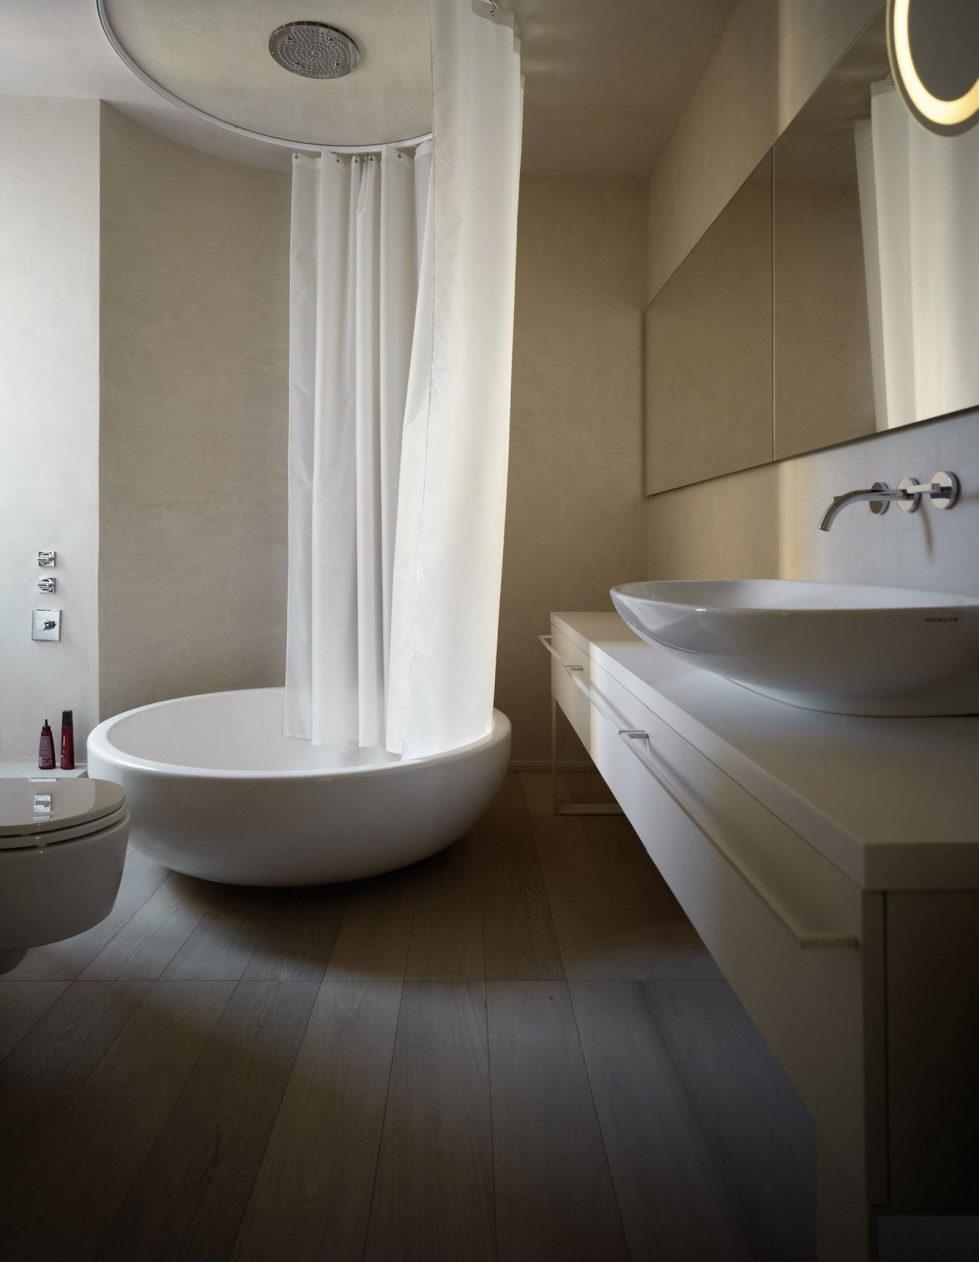 Three-level Apartments In Milan From Arassociati Architetti 13